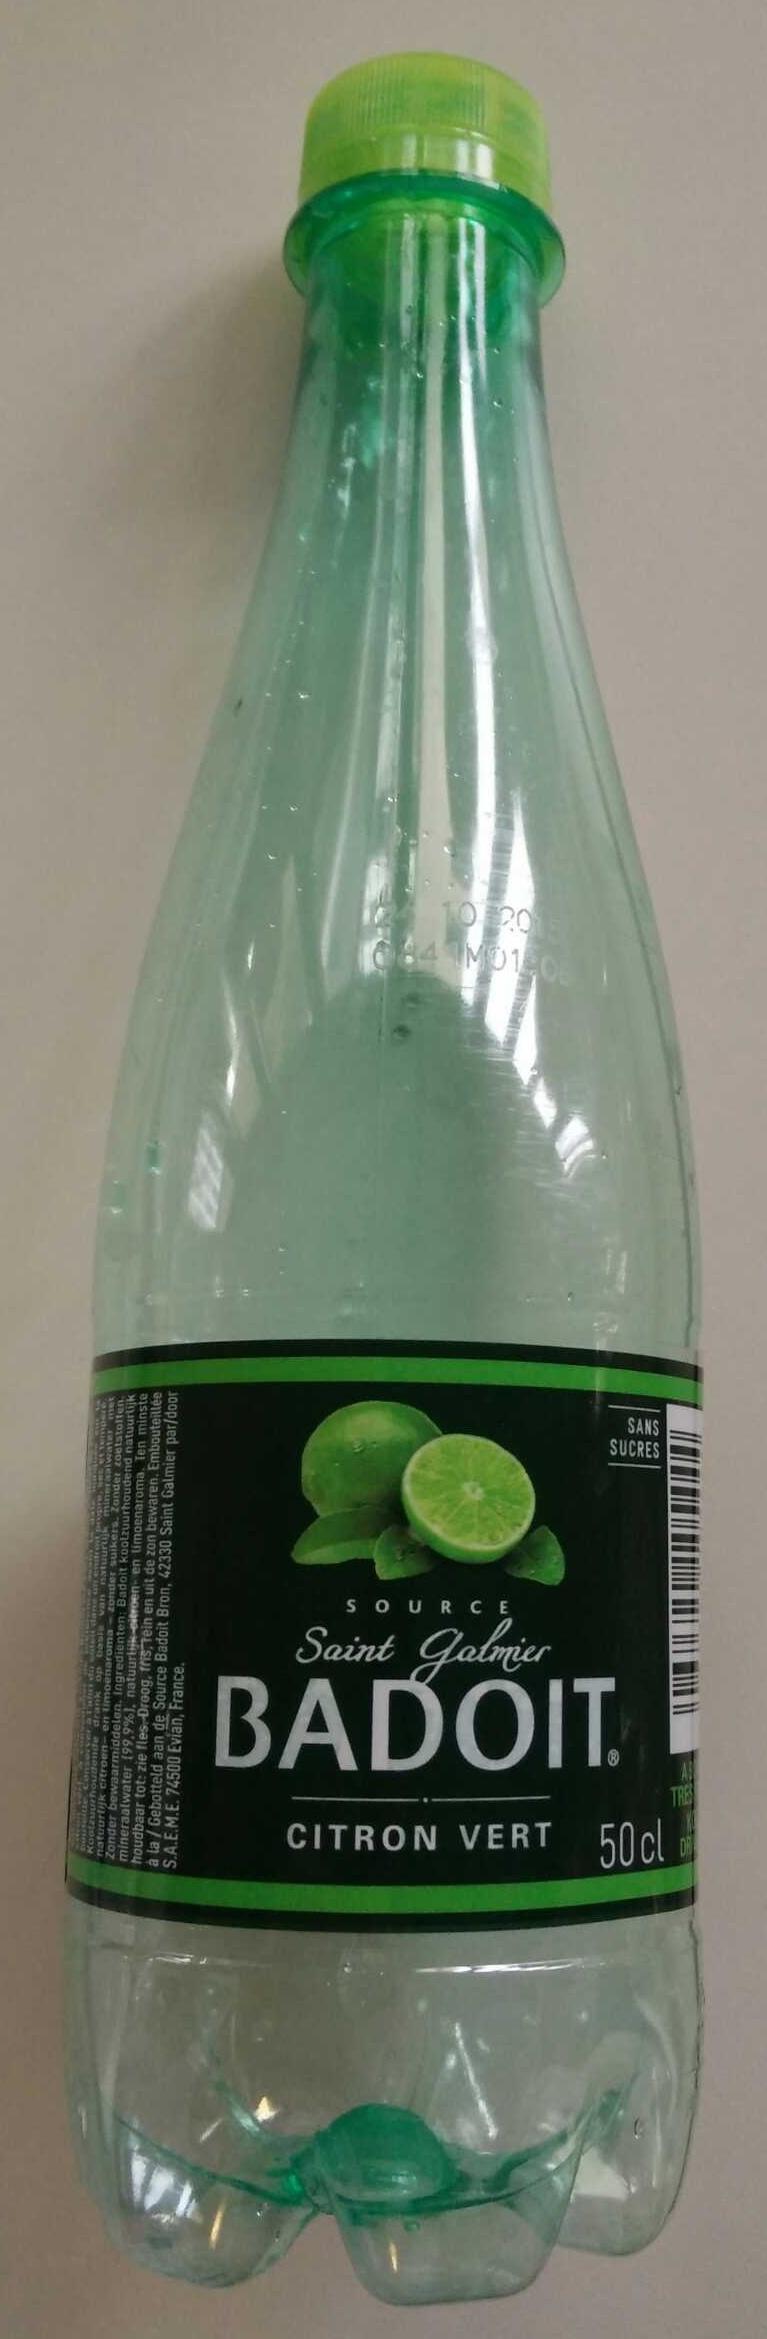 Badoit citron vert - Product - fr